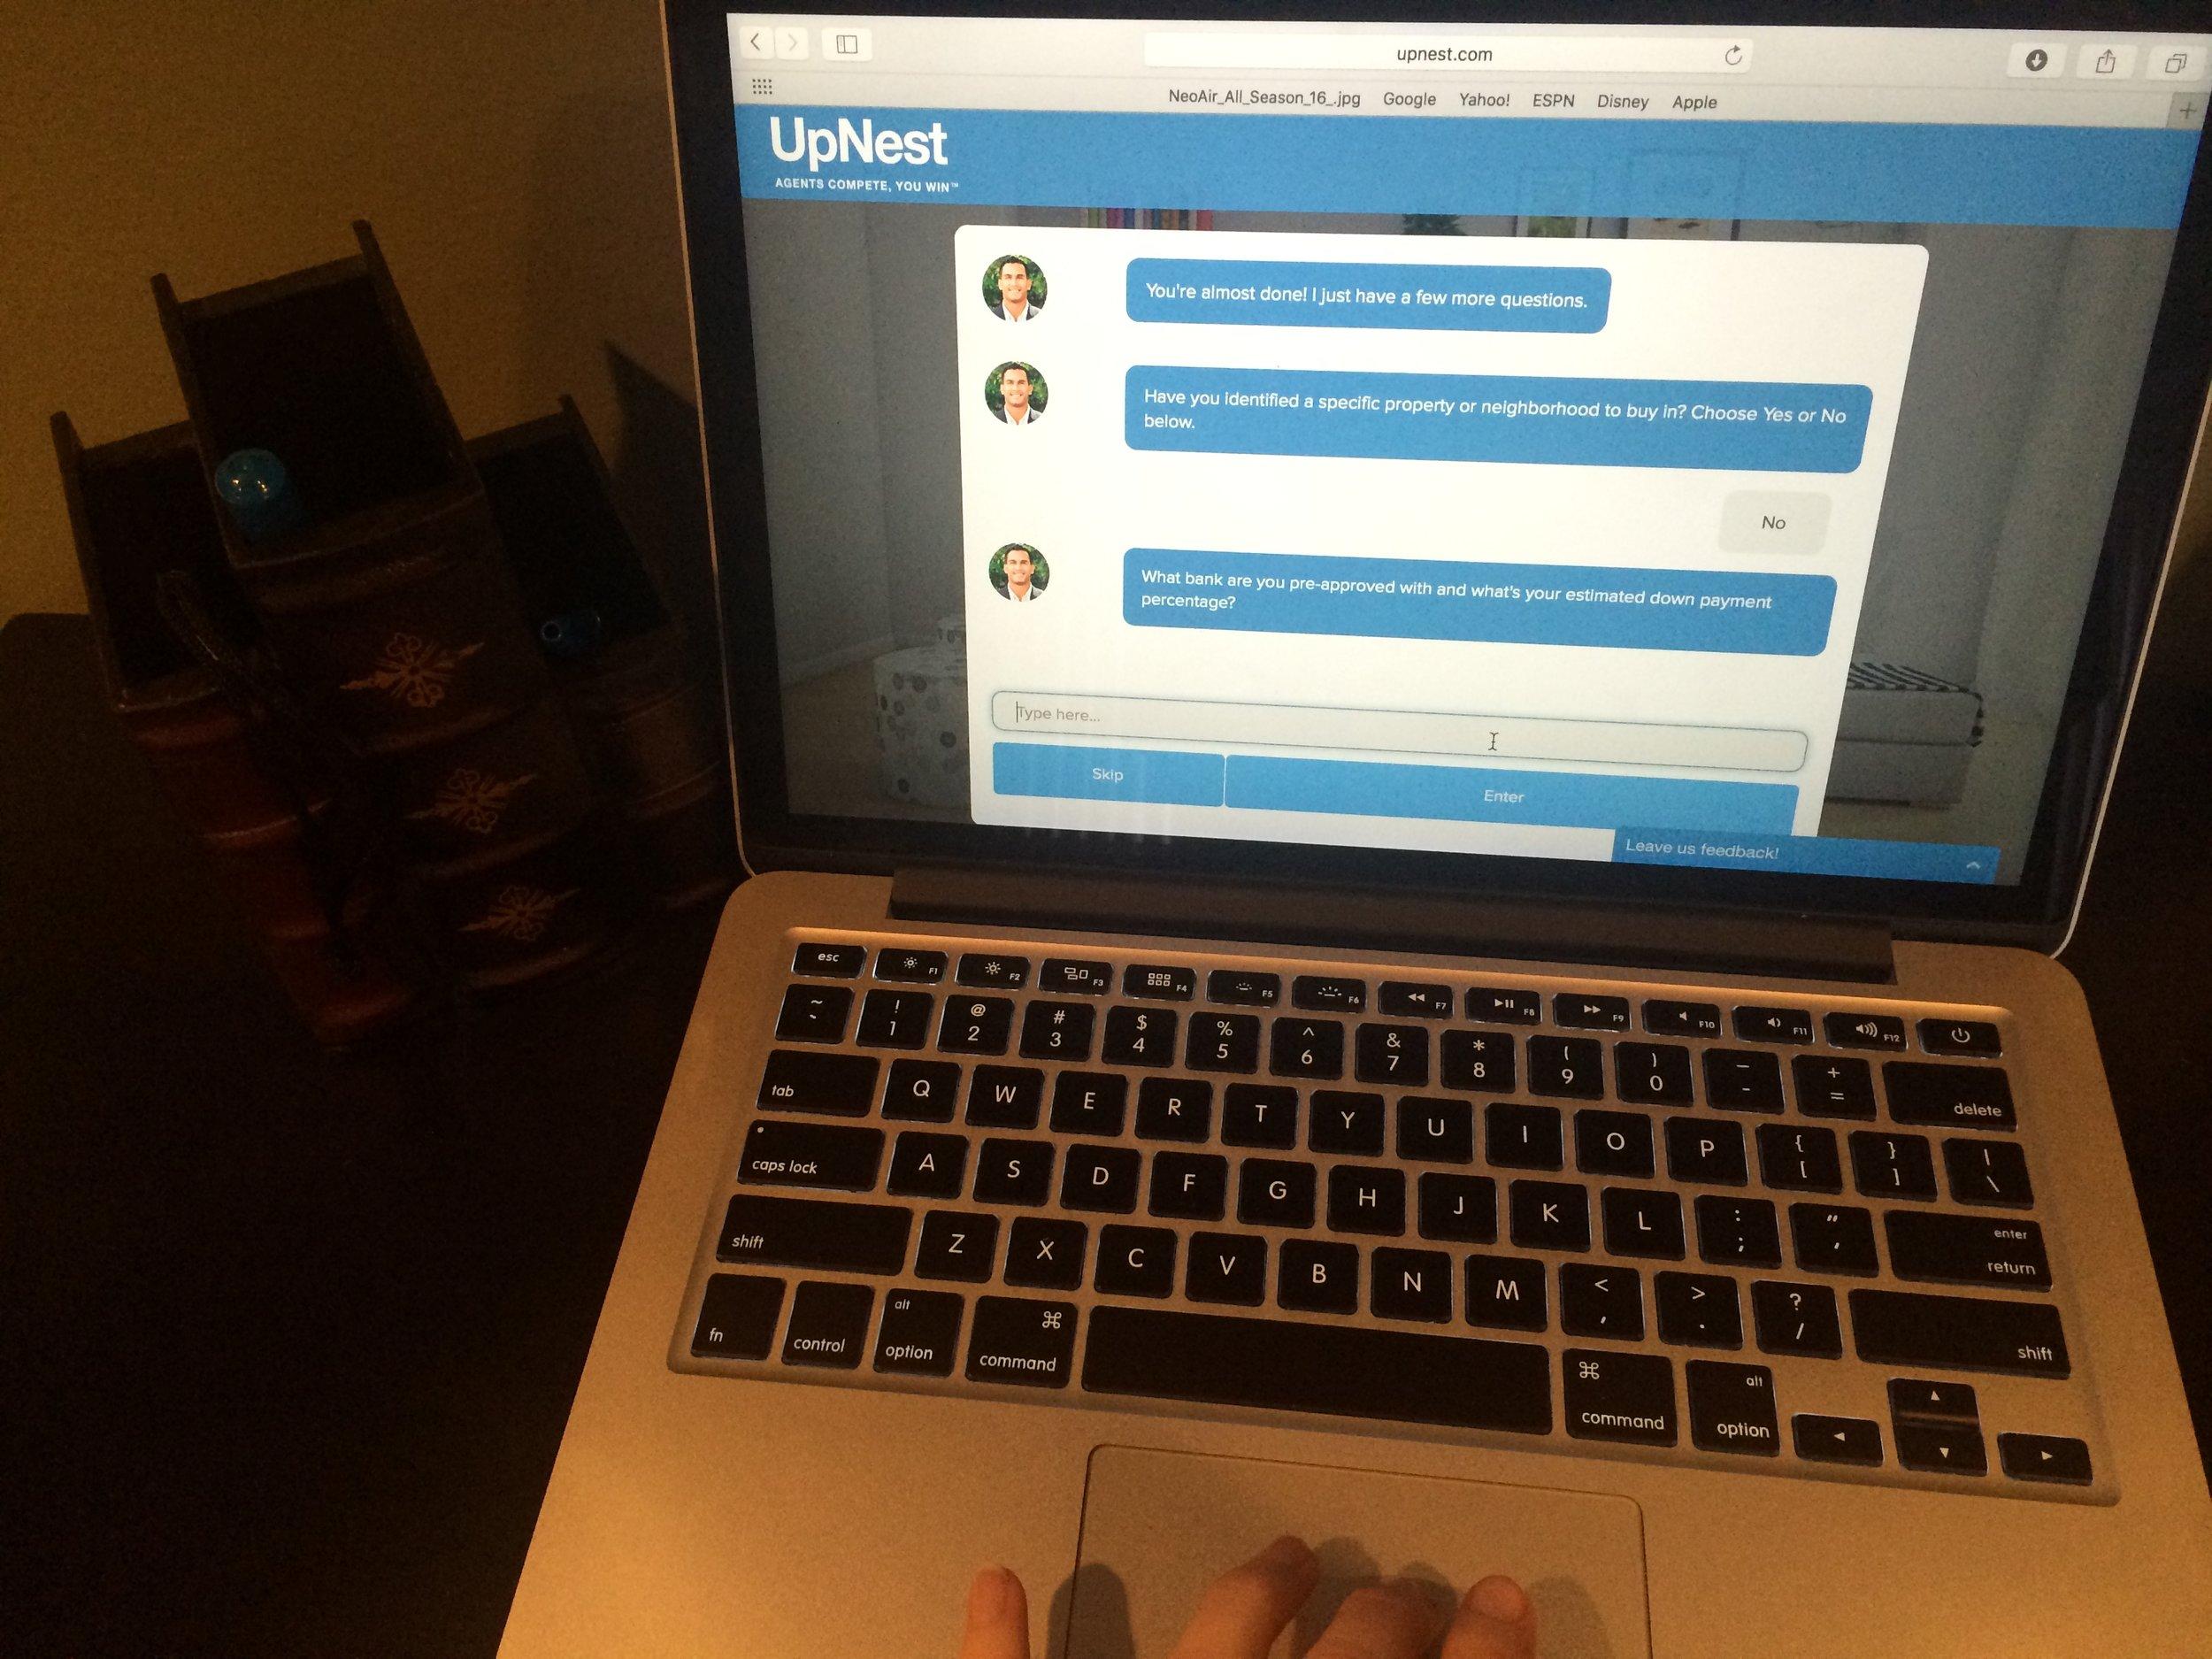 UpNest Review - whatthegirlssay.com